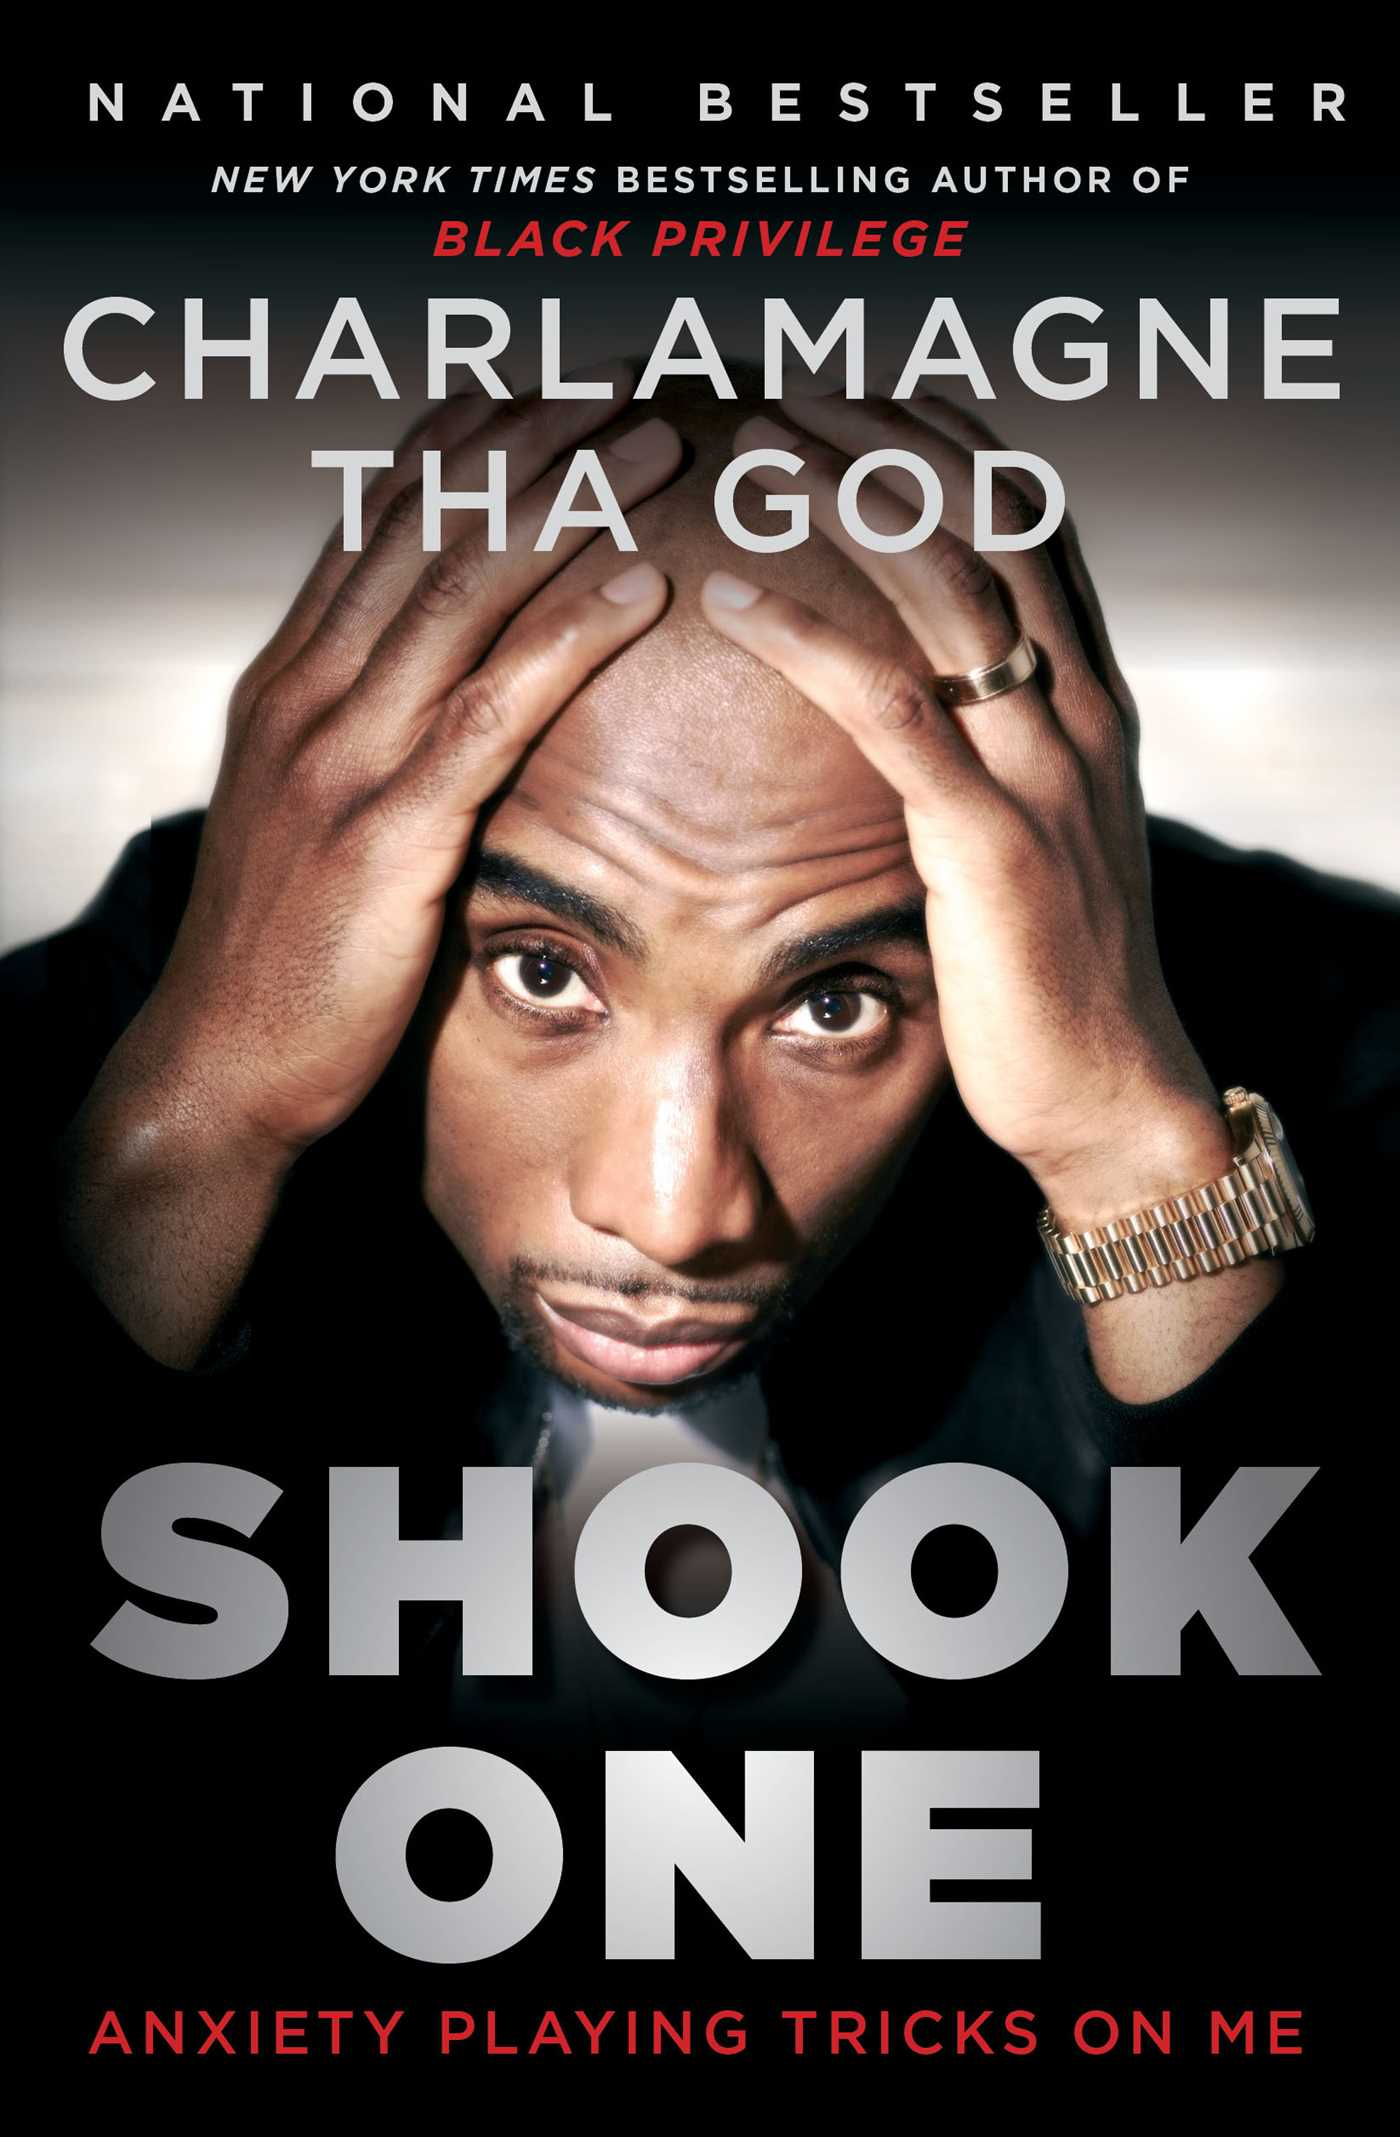 Shook one 9781501193279 hr